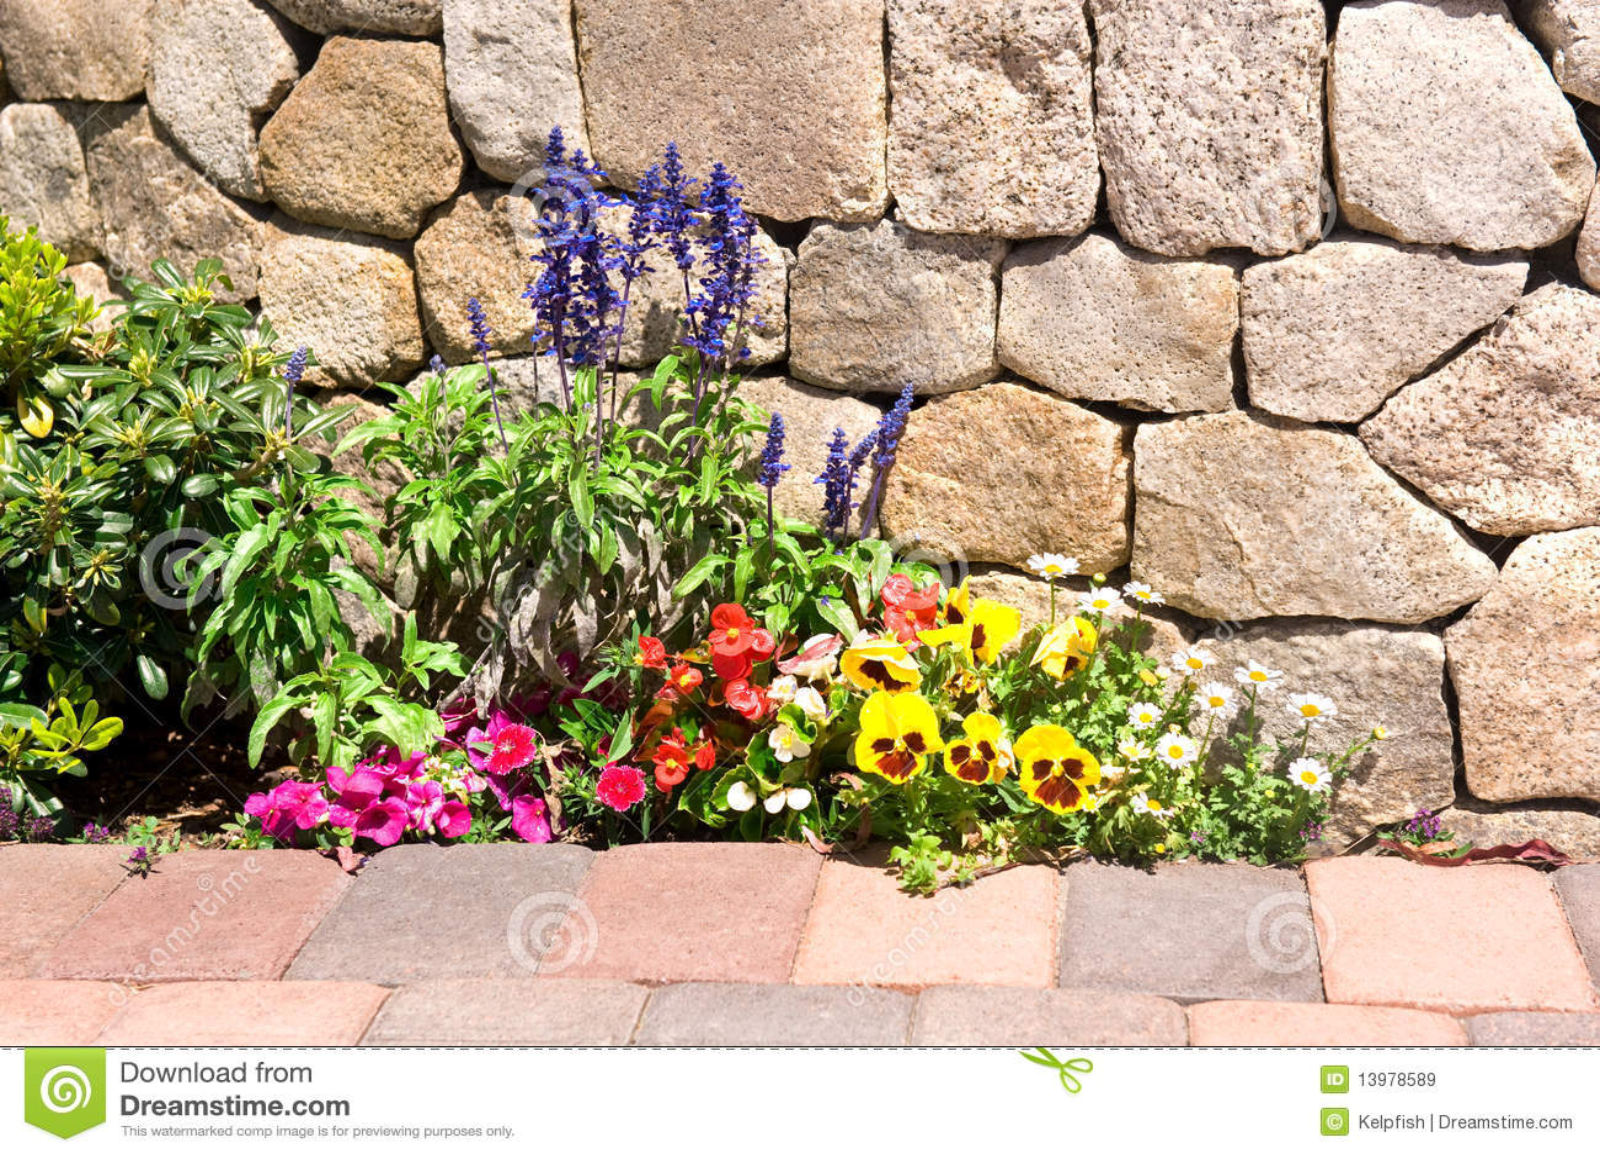 Flower garden along stone wall stock image image 13978589 for Flower wall garden